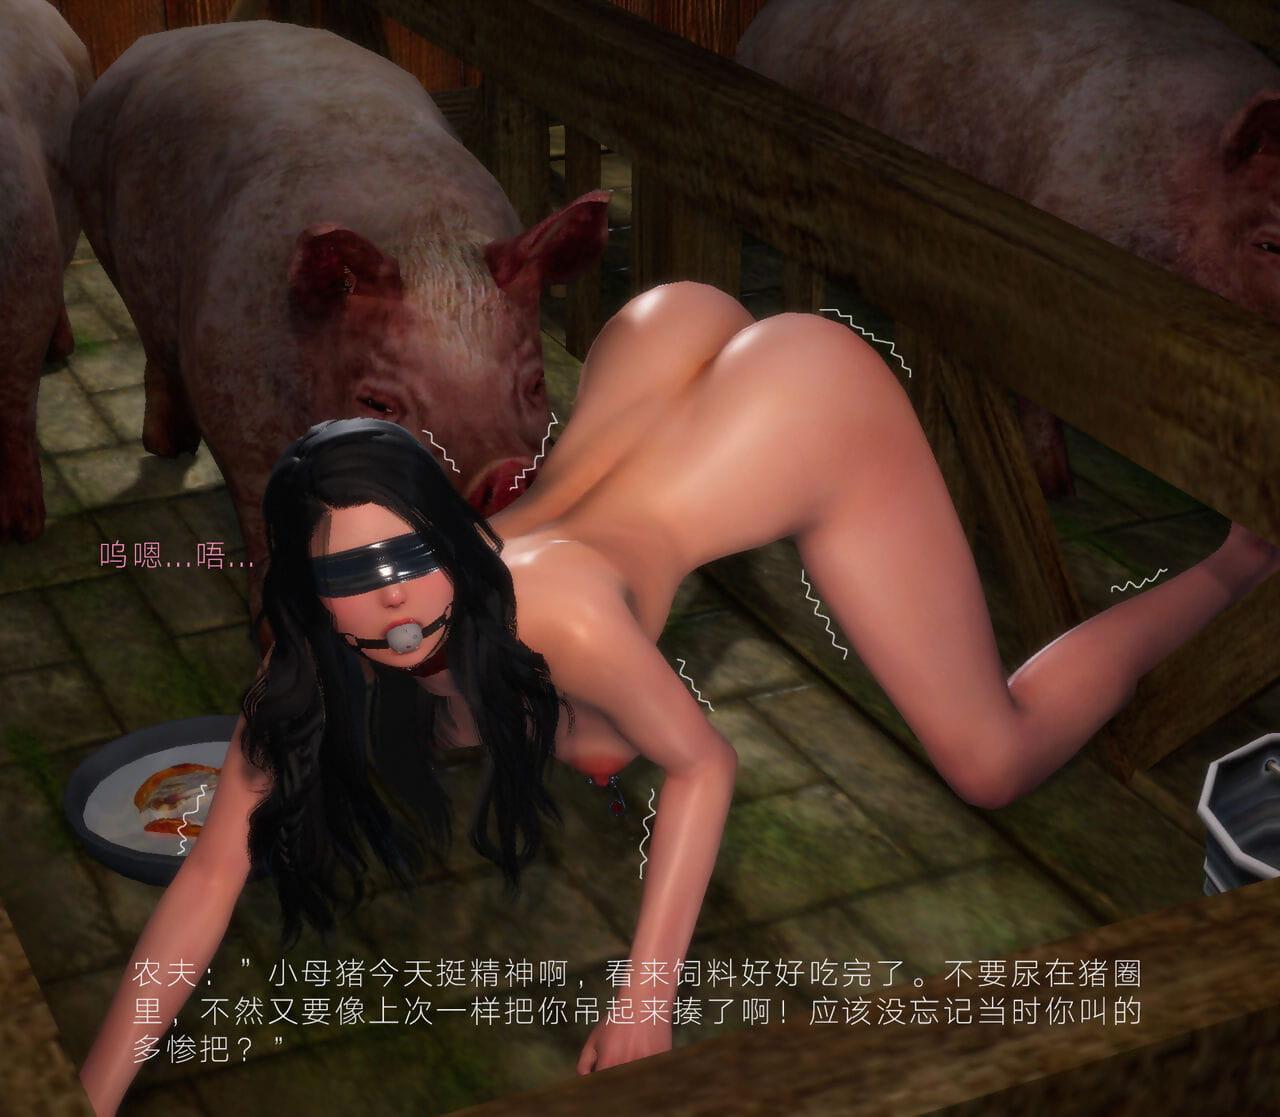 eifrost 母猪的新人生 Chinese